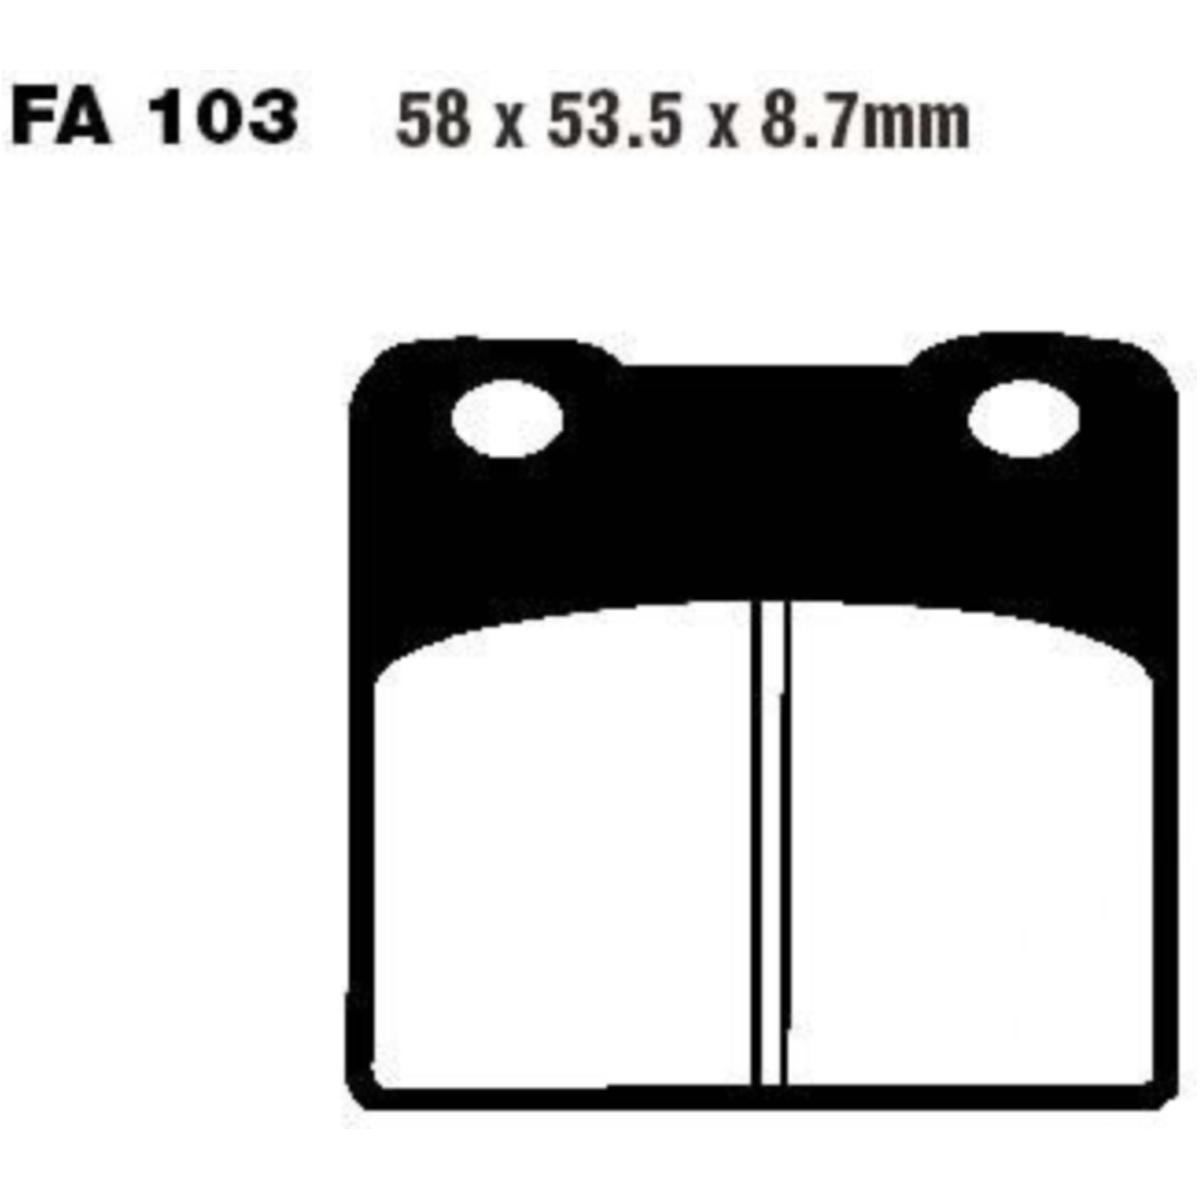 FA103 EBC Bremsbeläge organisch vorne Suzuki VS 800 Intruder VS52B 1992-2000 NEU